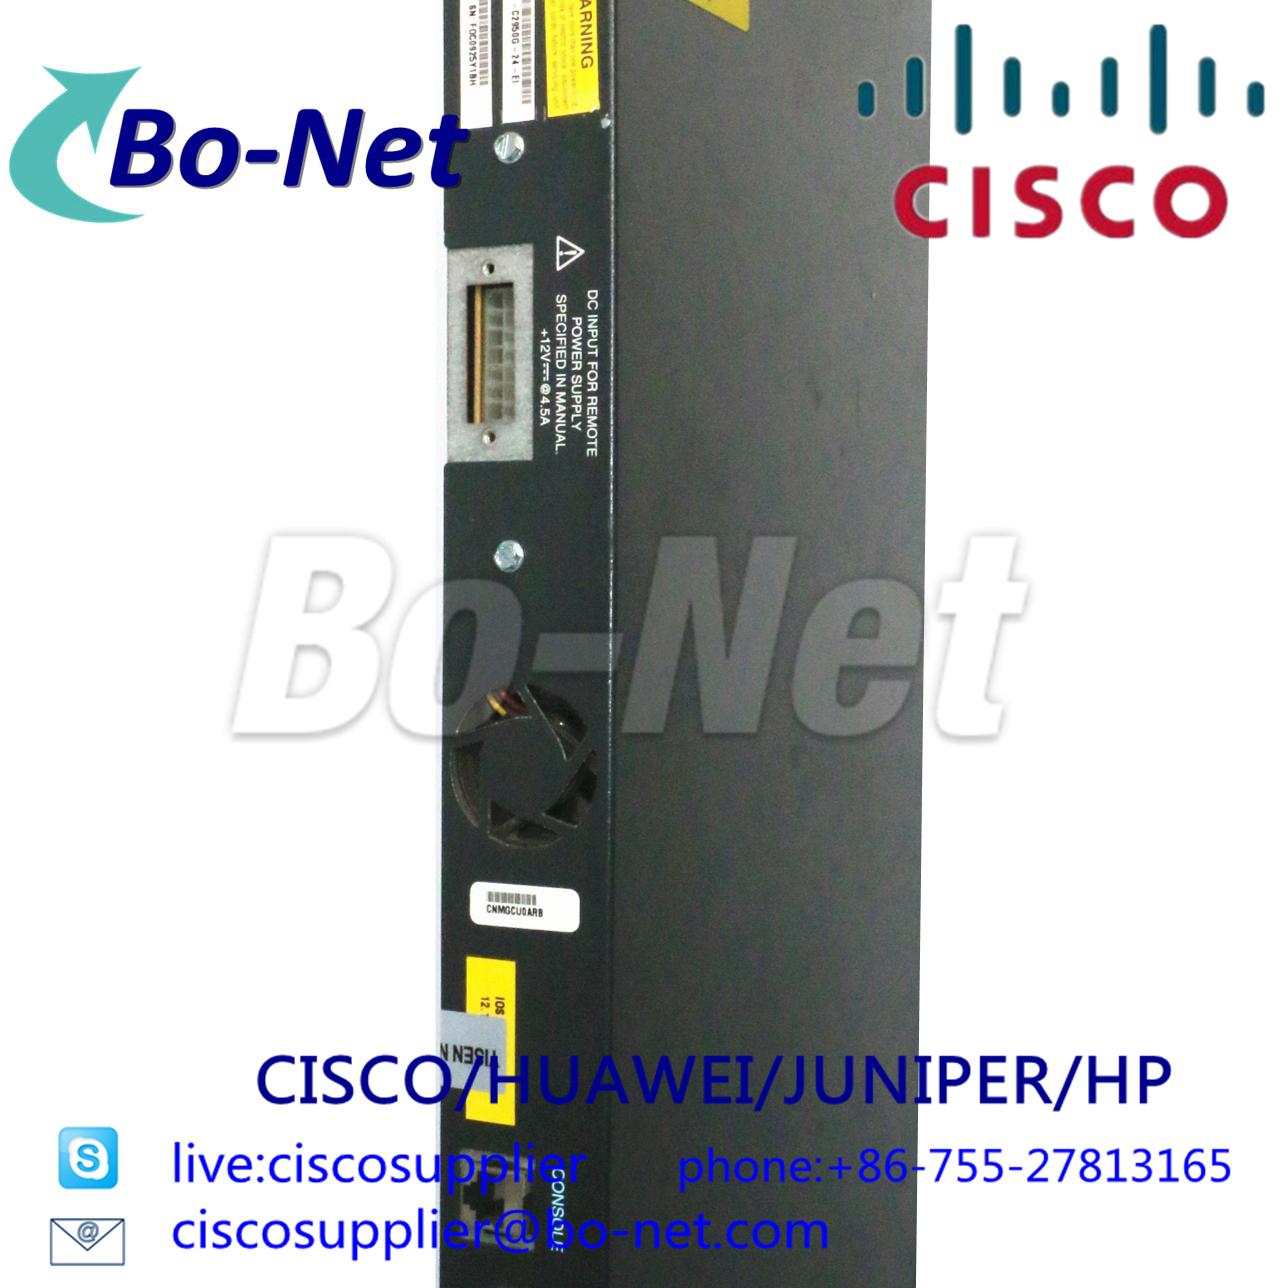 CISCO WS-C2950G-24-EI network switches Cisco select partner BO-NET